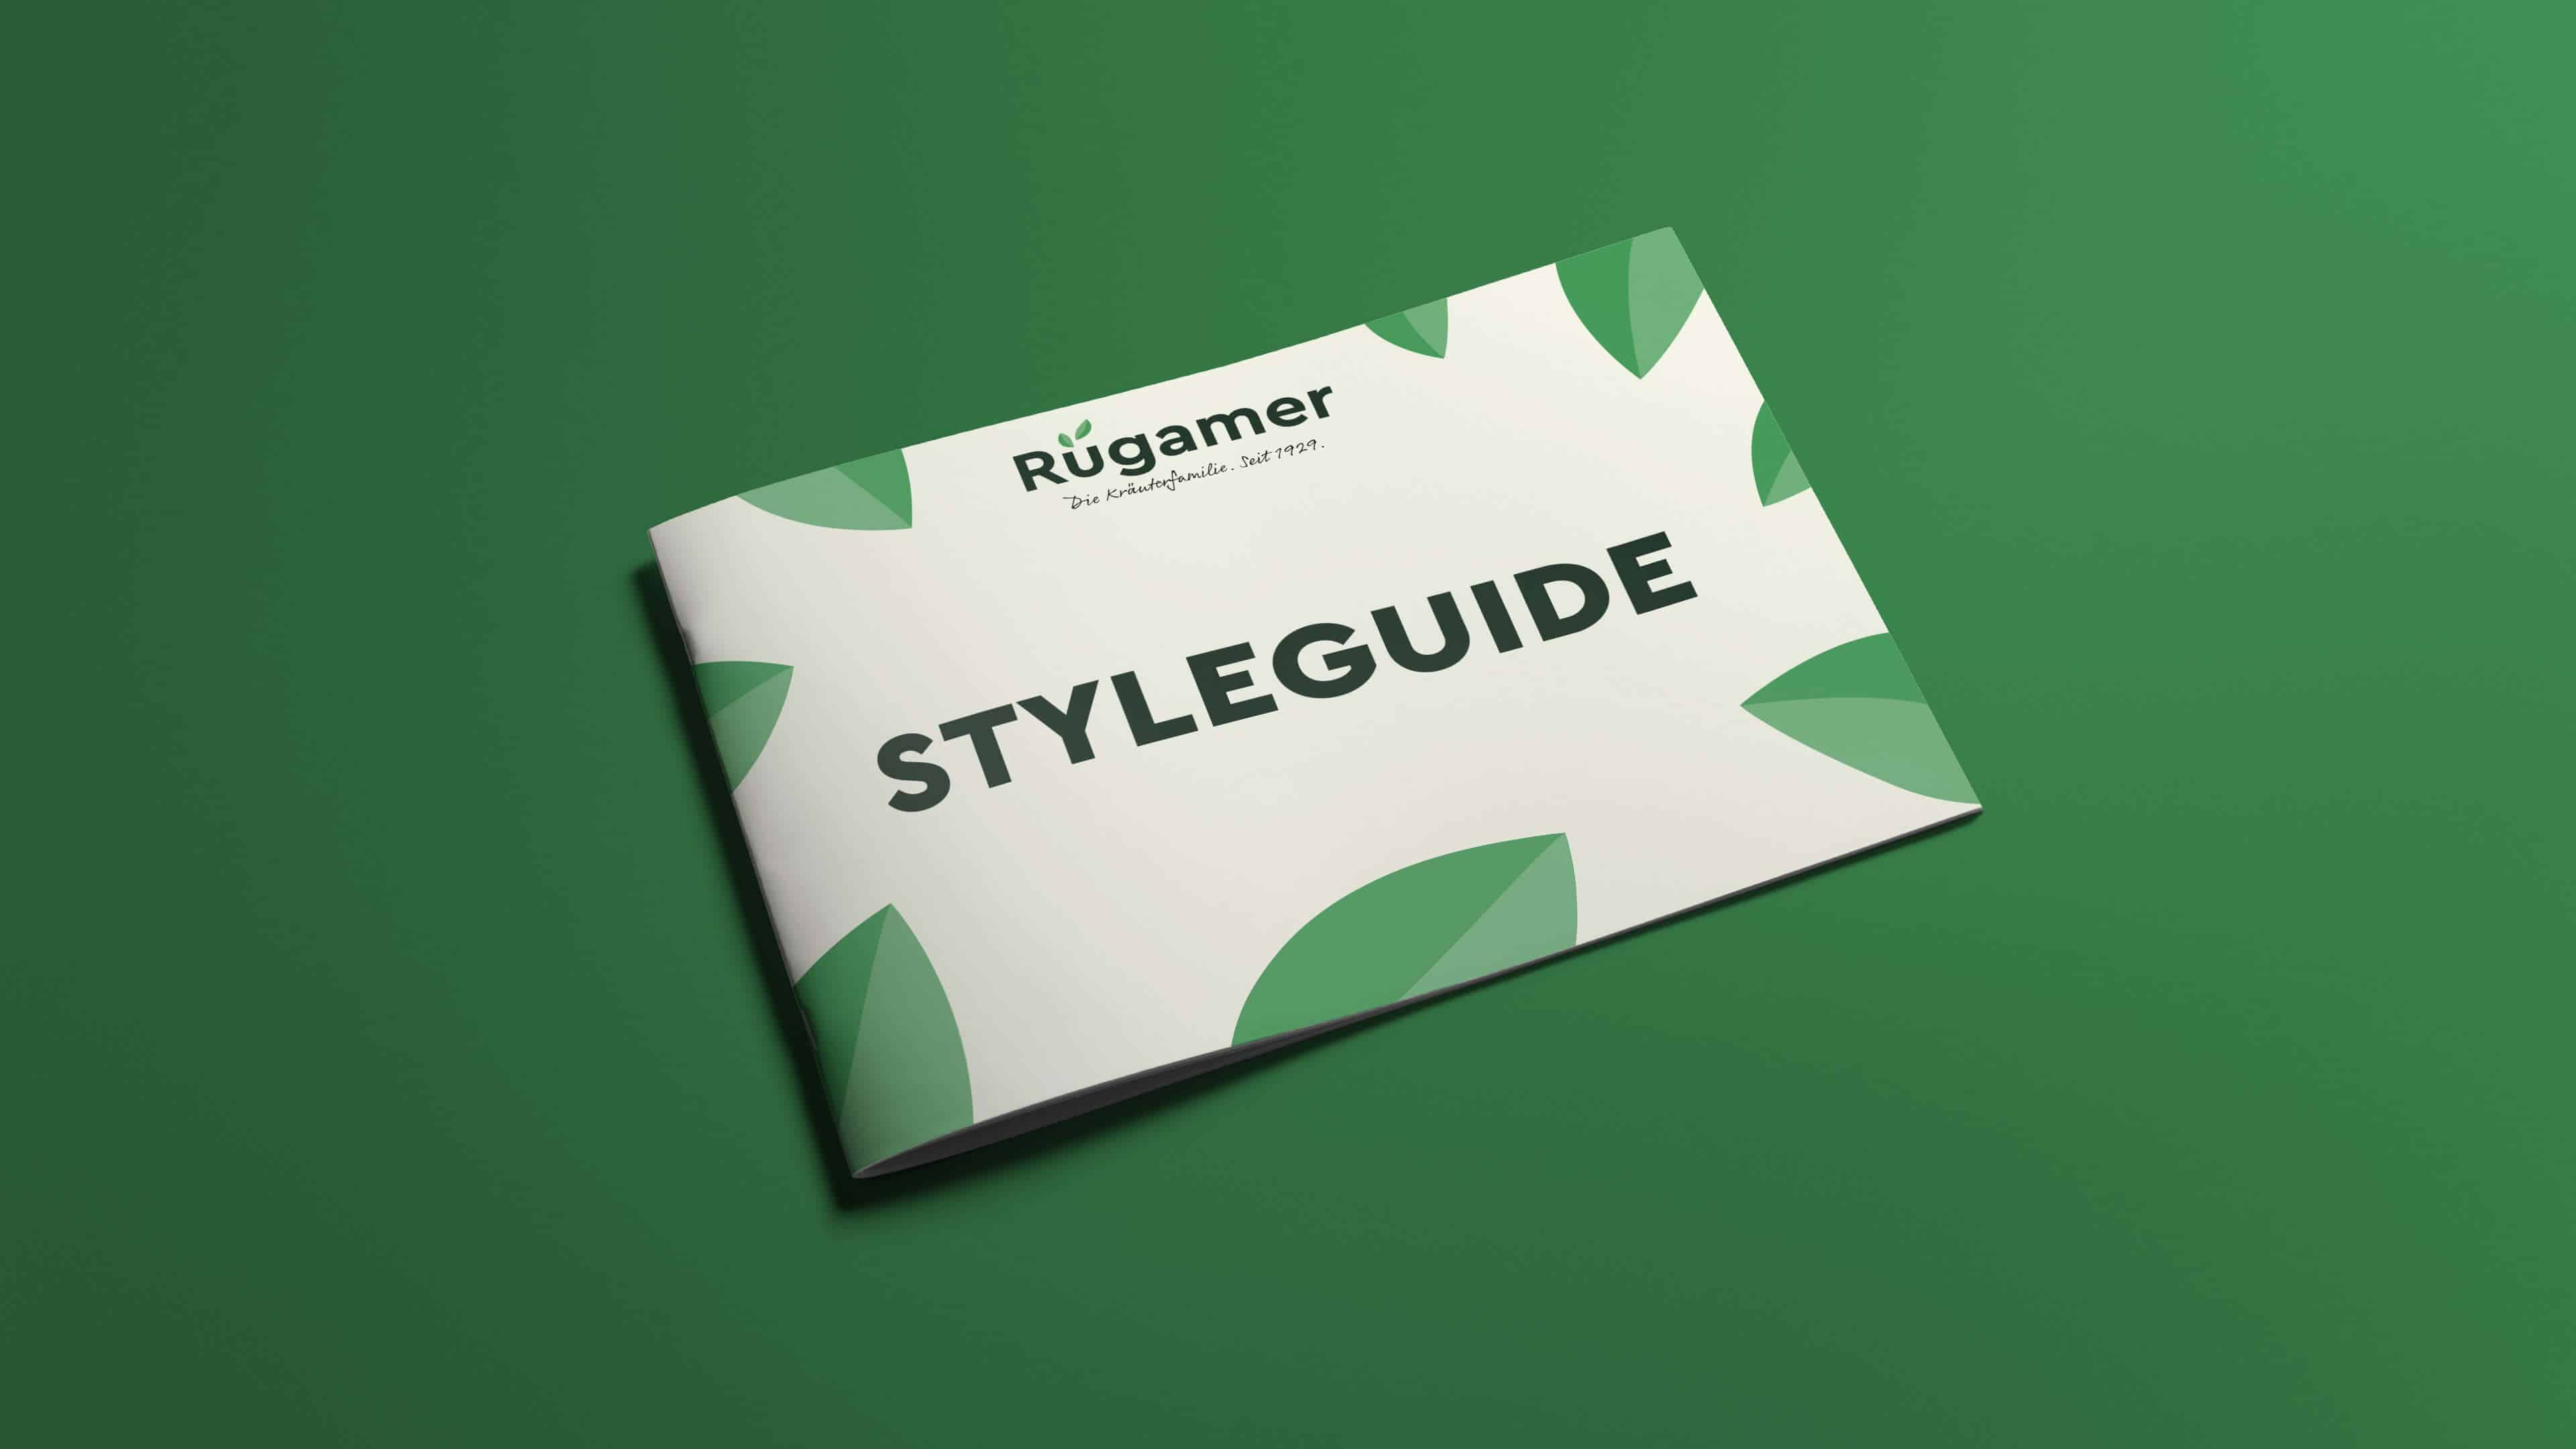 Styleguide-S1